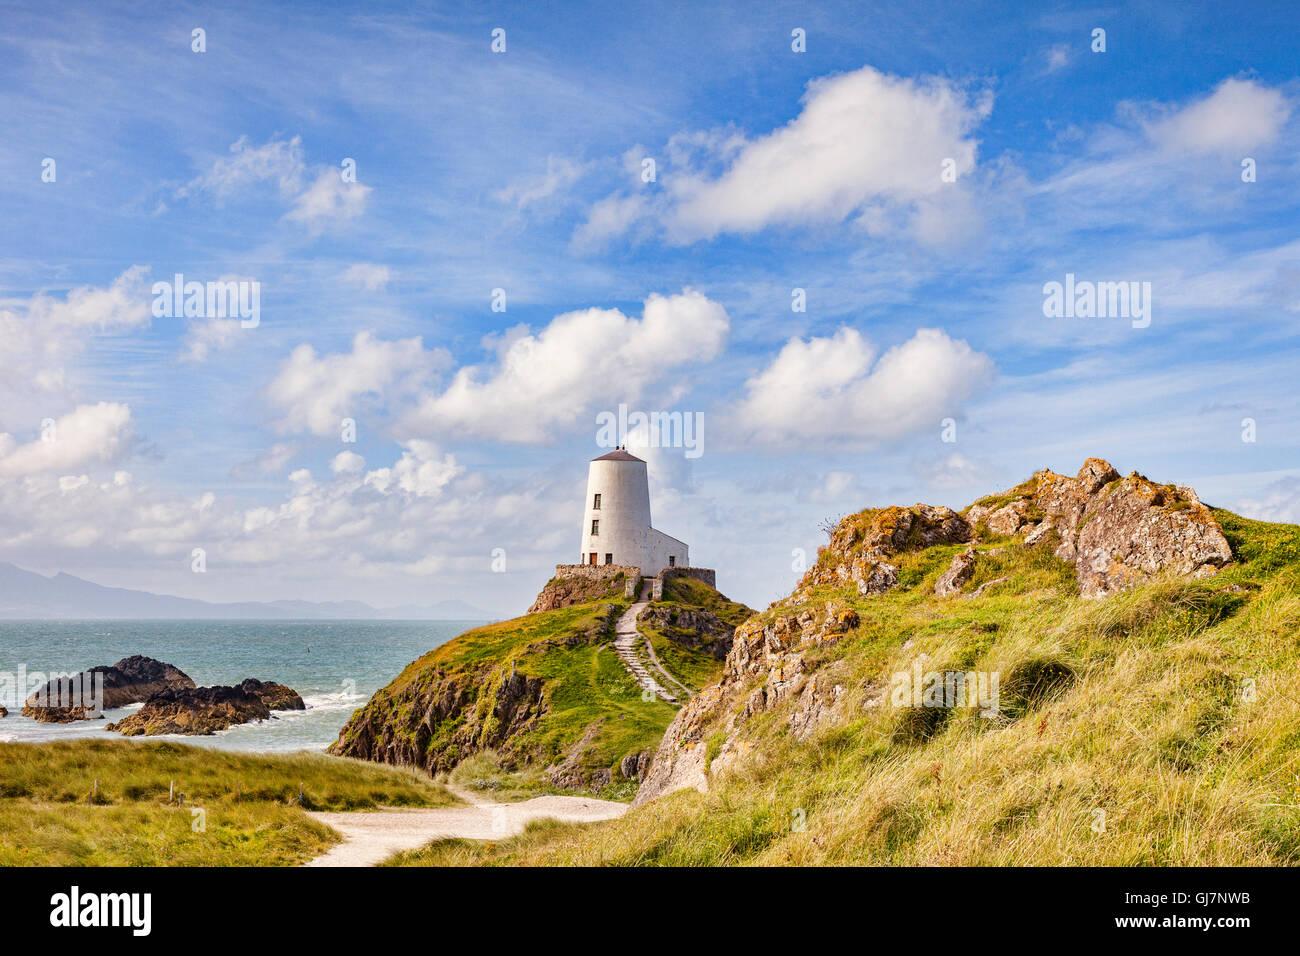 Twr Mawr, el viejo faro en la isla de Ynys Llanddwyn mareas, Newborough, Anglesey, Gales, Reino Unido Foto de stock